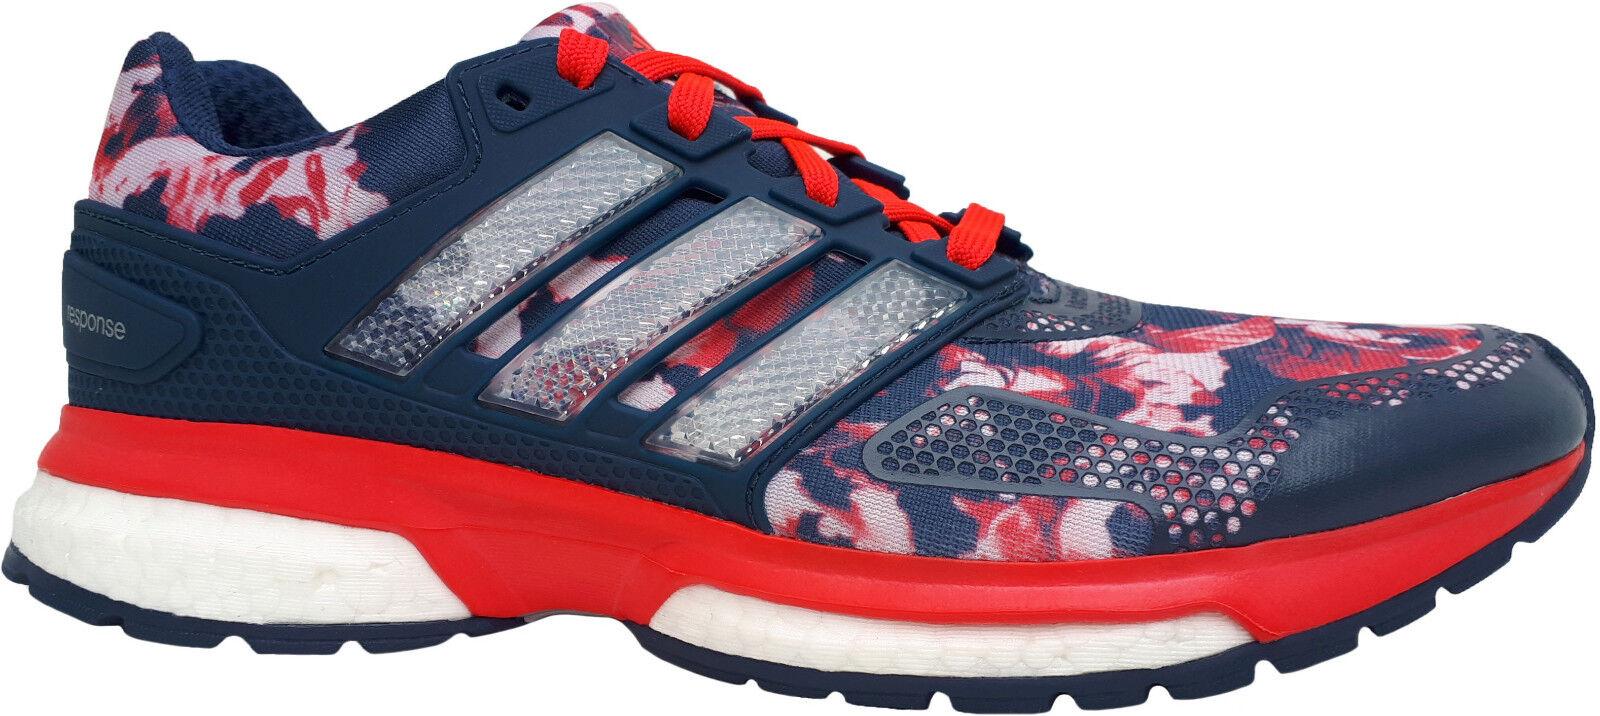 Adidas Responce 2 Graphic W Sneaker Boost Laufschuhe Gr. 38 Sneaker W Sport Fitness Schuhe 37095c